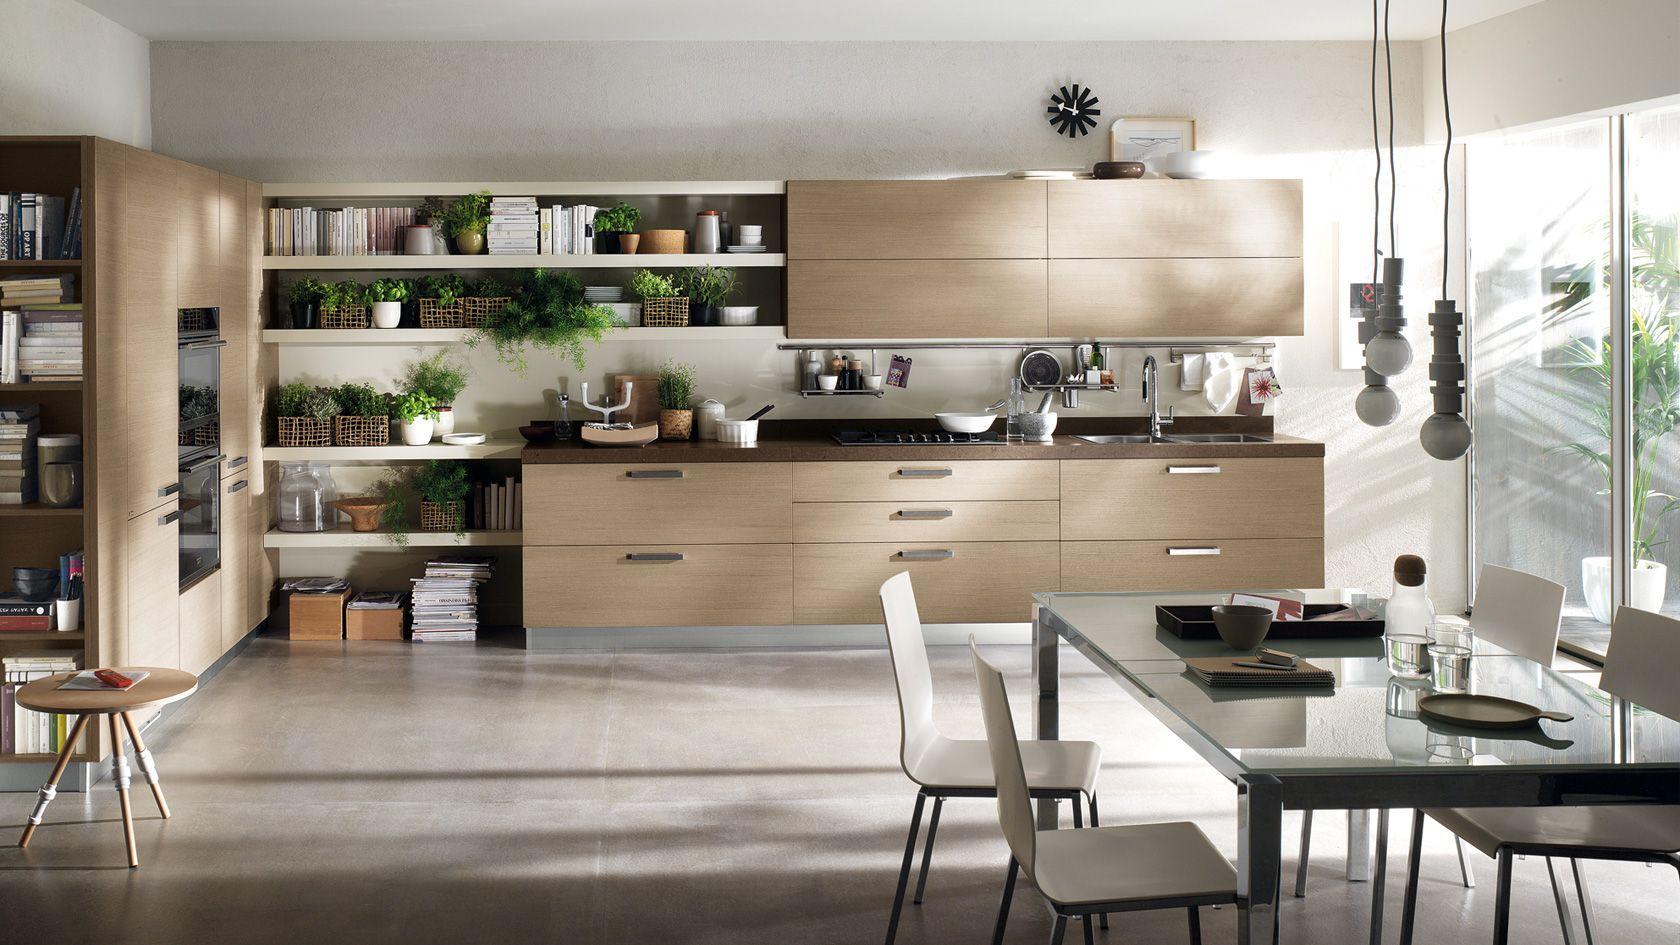 Cocina Feel Scavolini | redhouse | Pinterest | Diseño de cocina ...